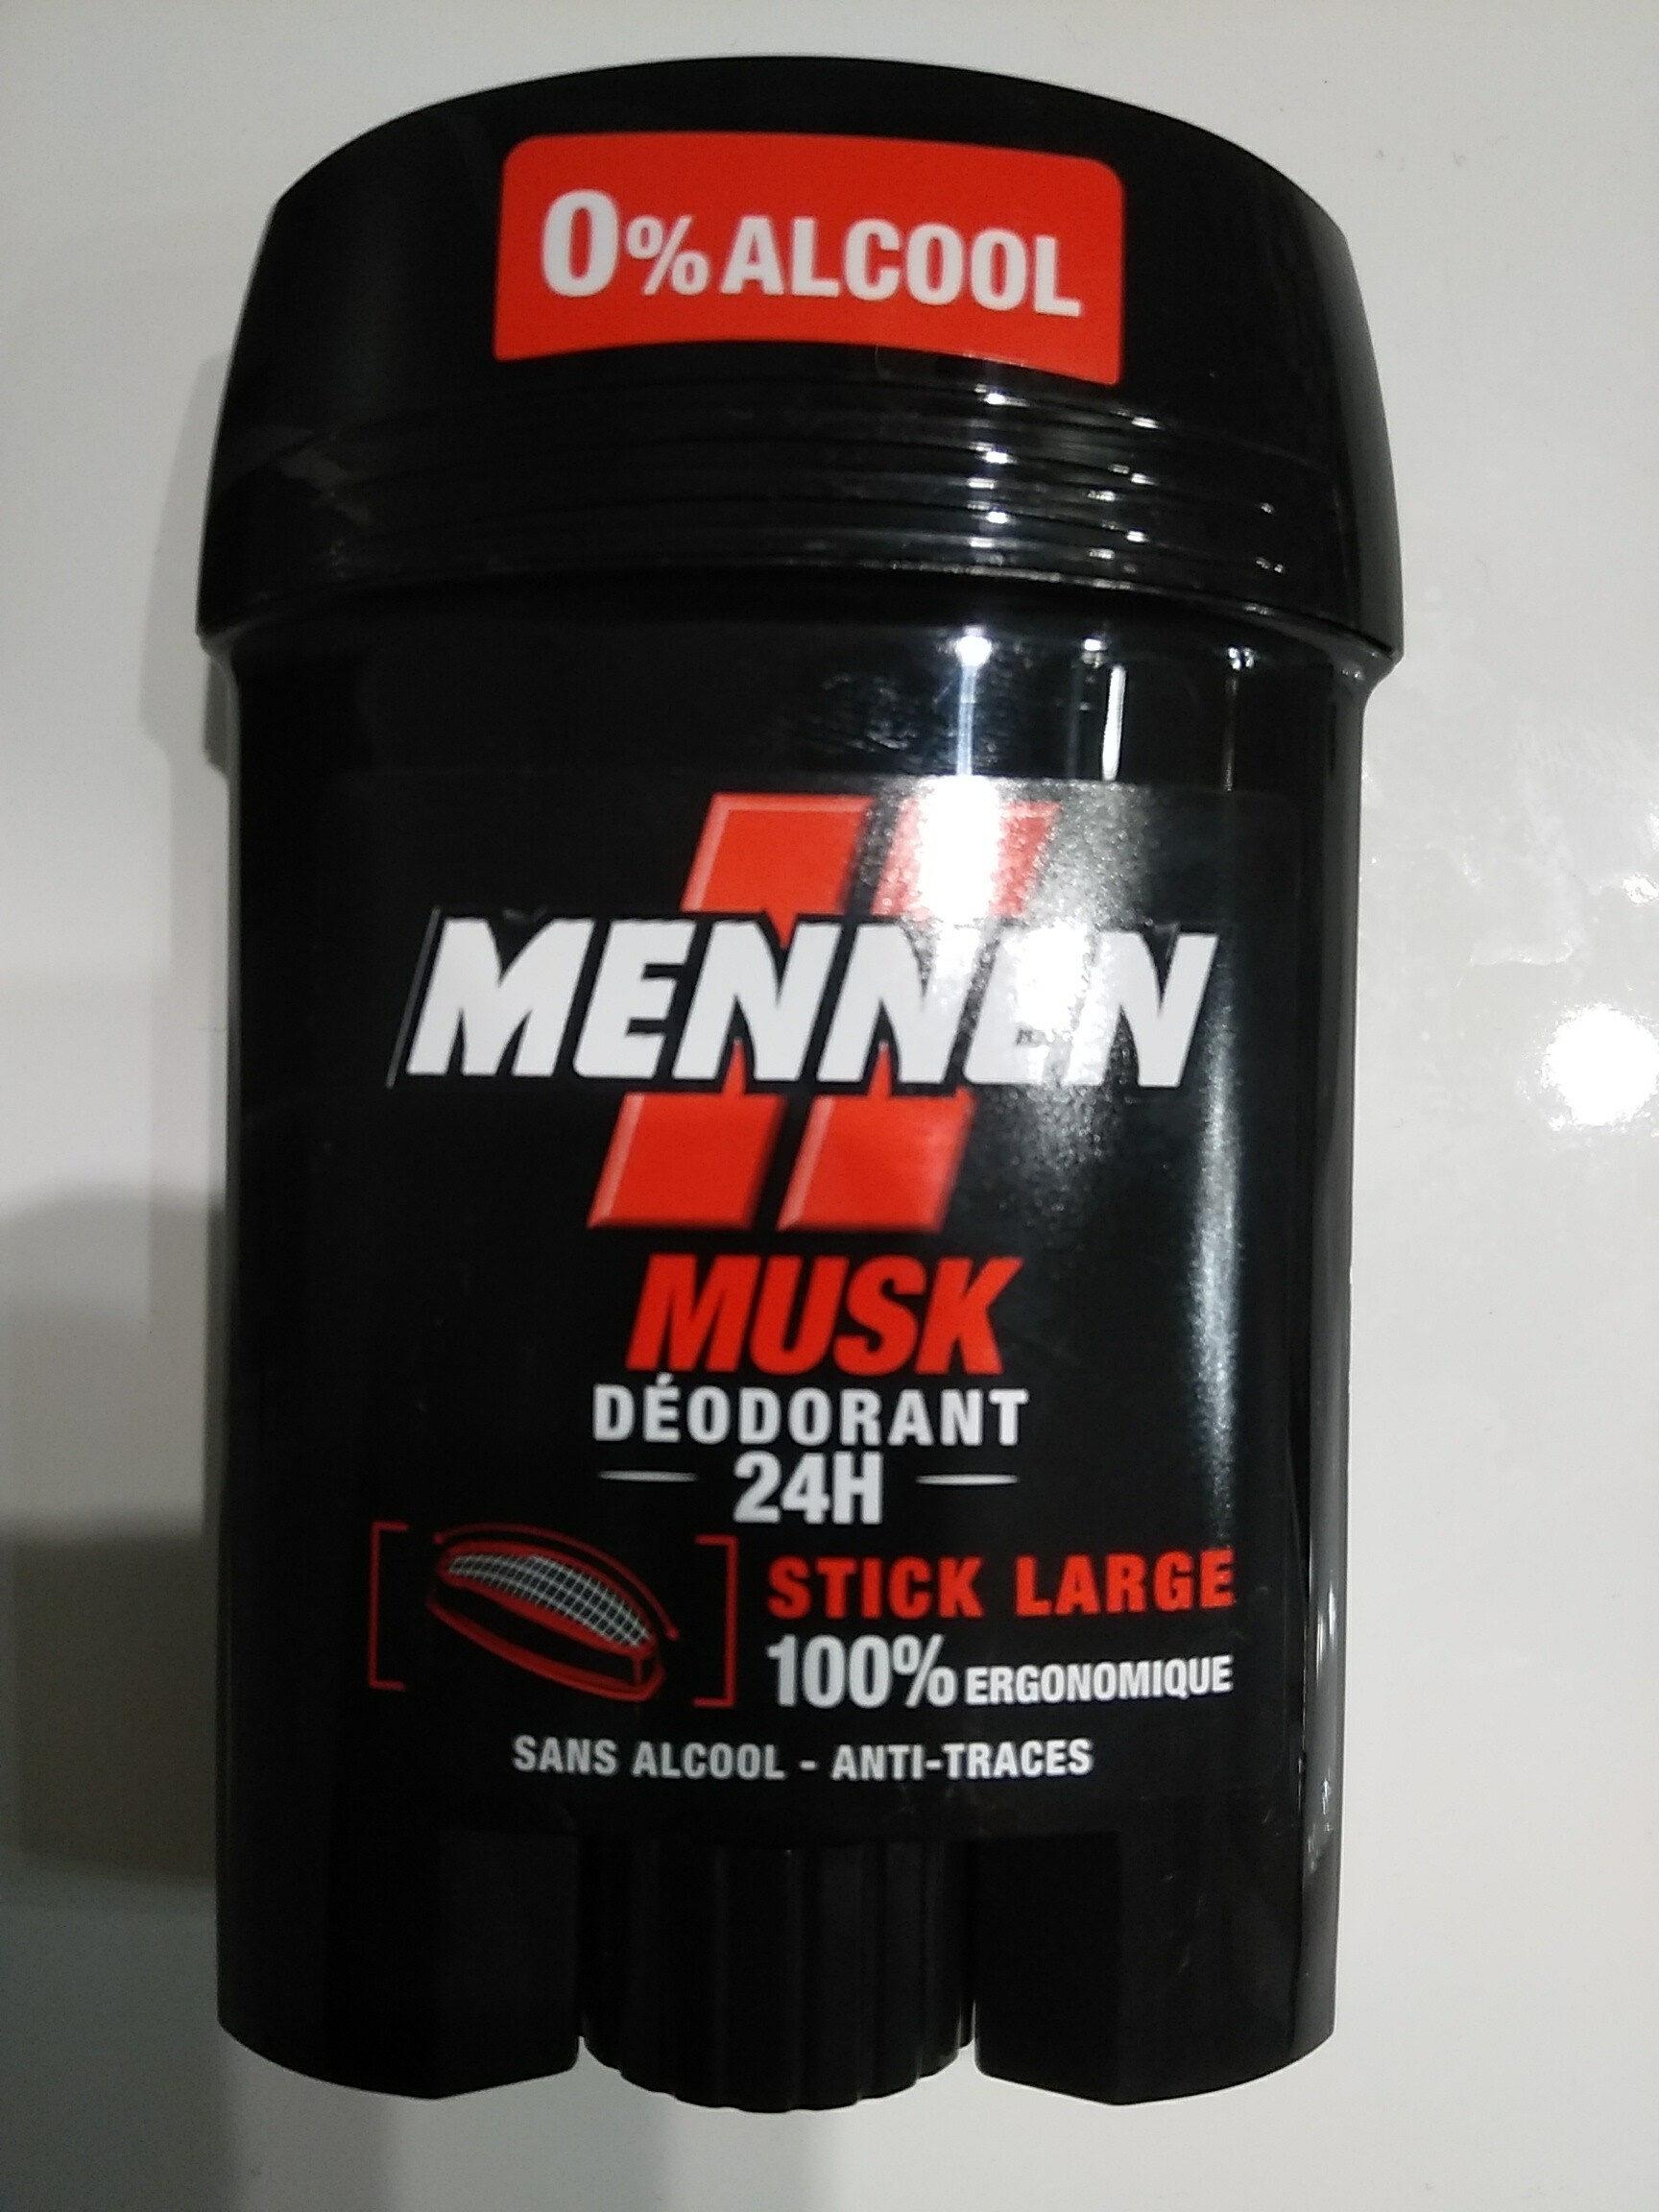 mennen musk déodorant 24h - Product - fr